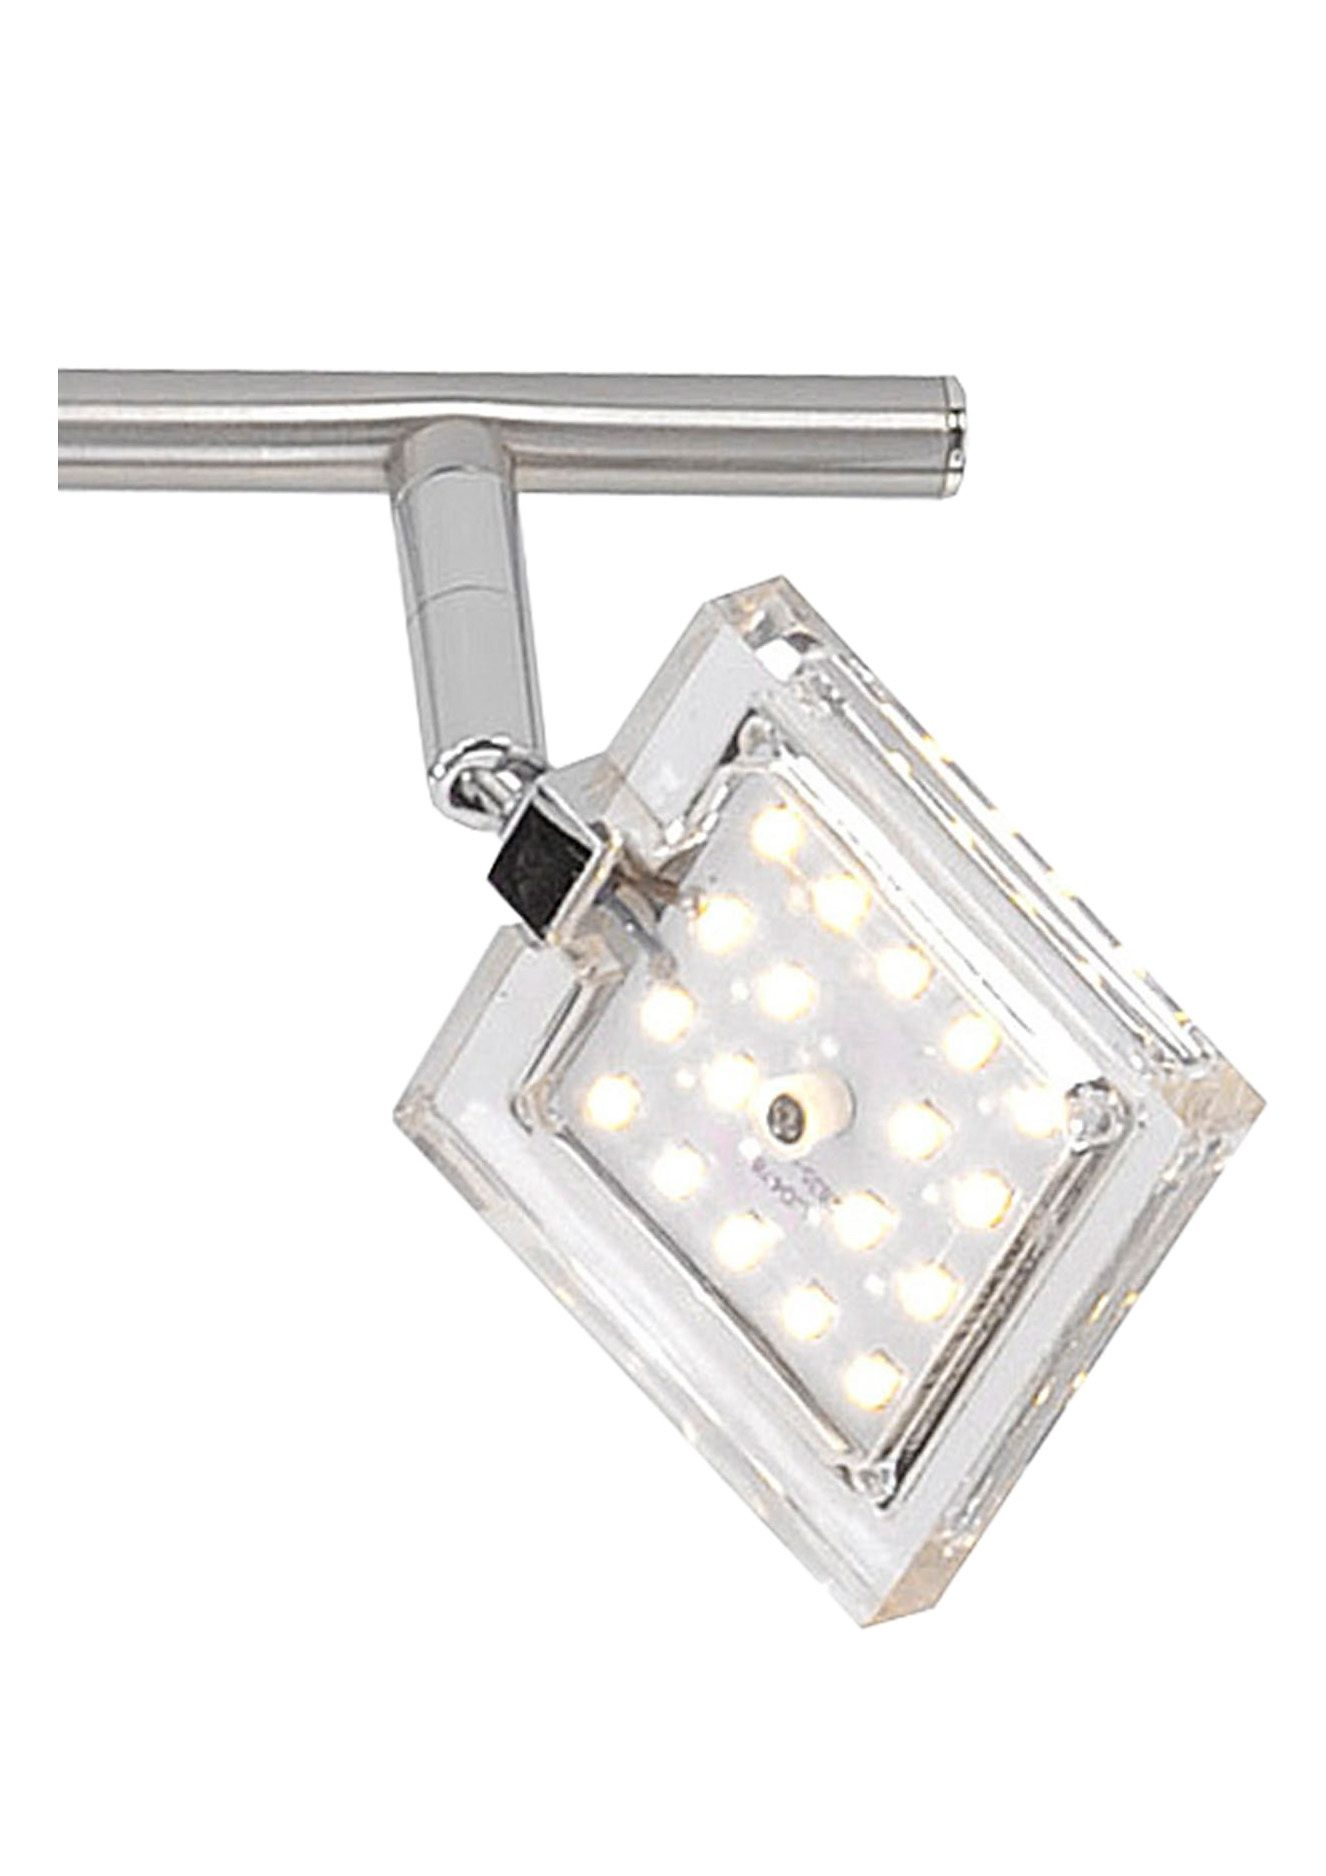 Paul Neuhaus LED-Deckenleuchte, 64flg., »DAAN«